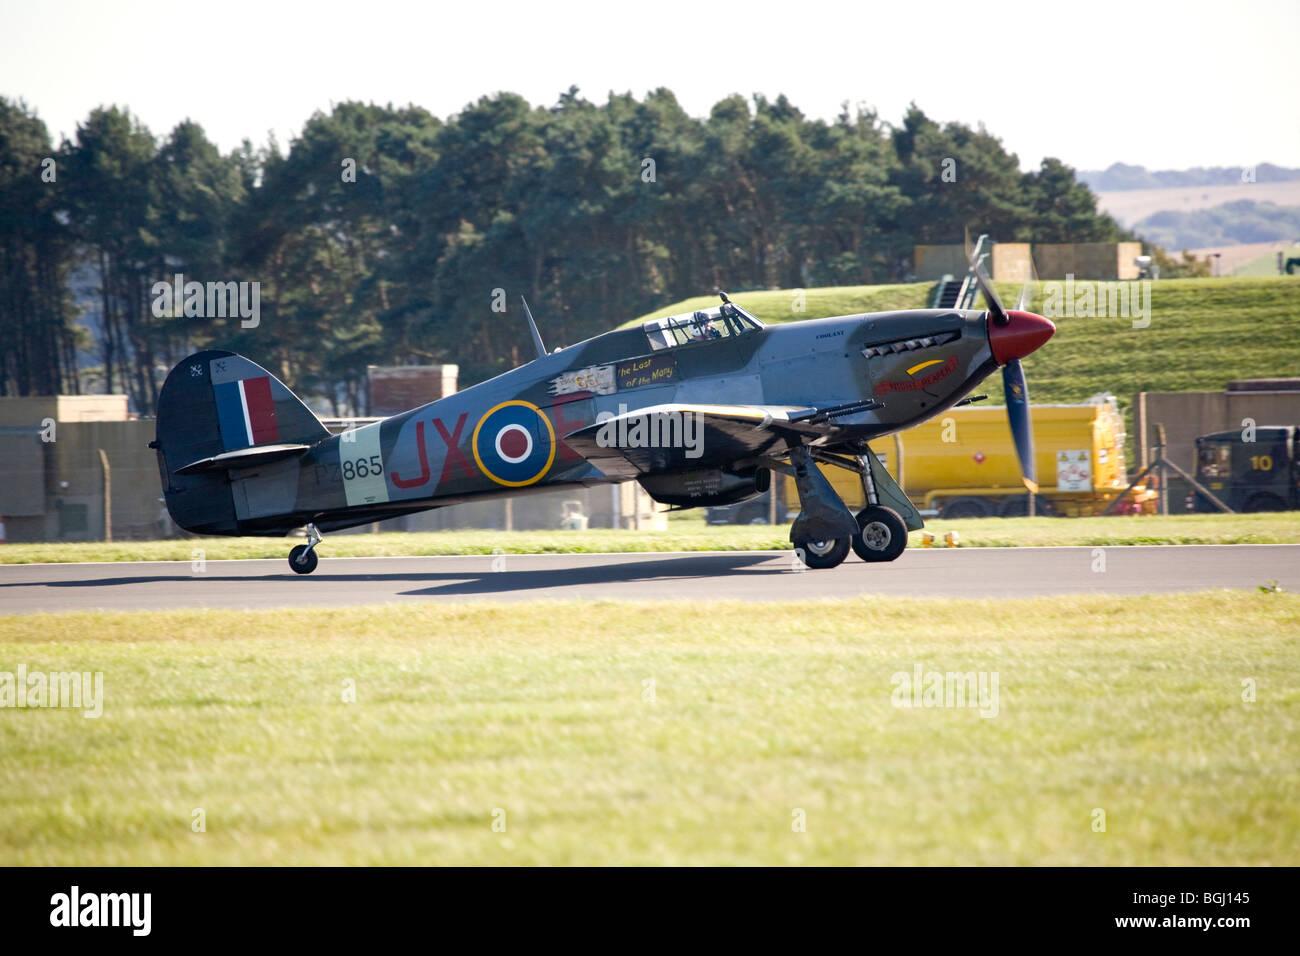 Hurricane PZ865 (Mk IIc) from the Battle of Britain Memorial Flight at RAF Leuchars Airshow 2009, Fife, Scotland - Stock Image